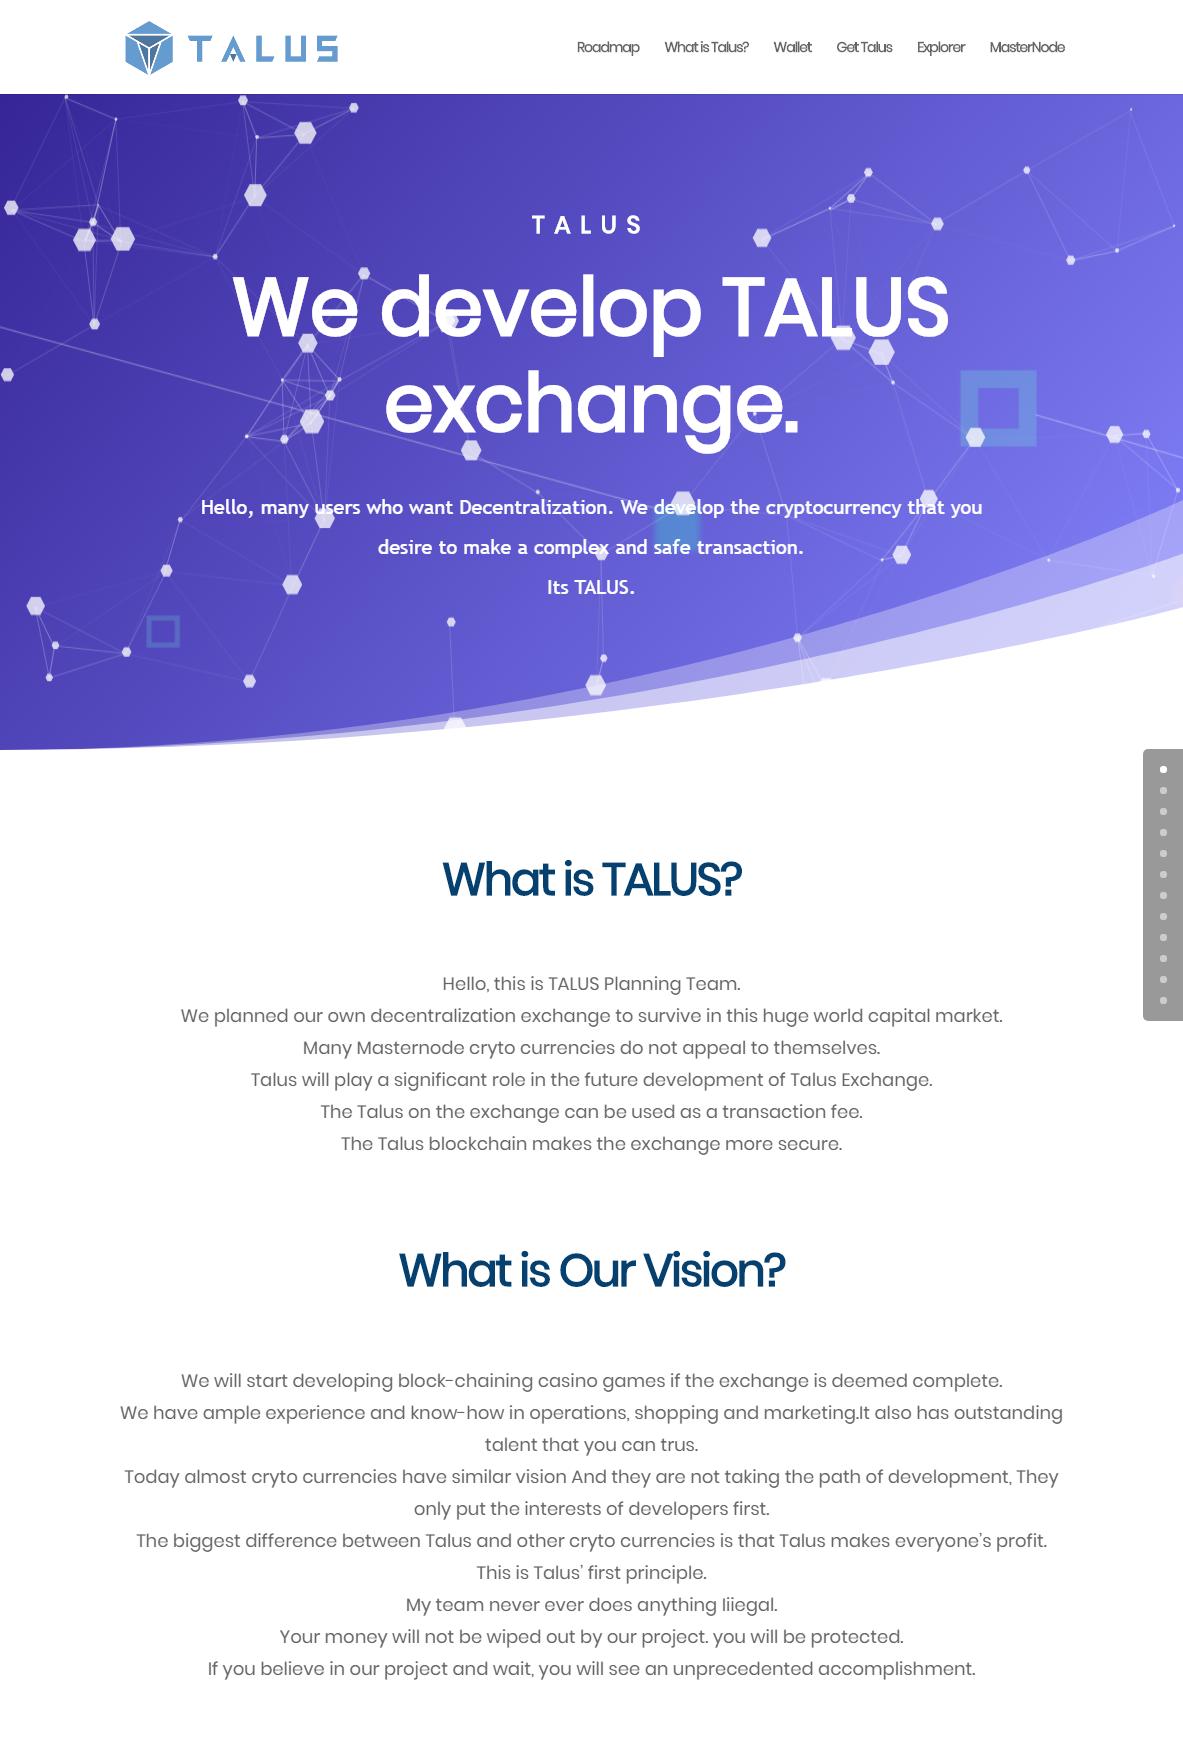 TALUS Decentralize exchange1